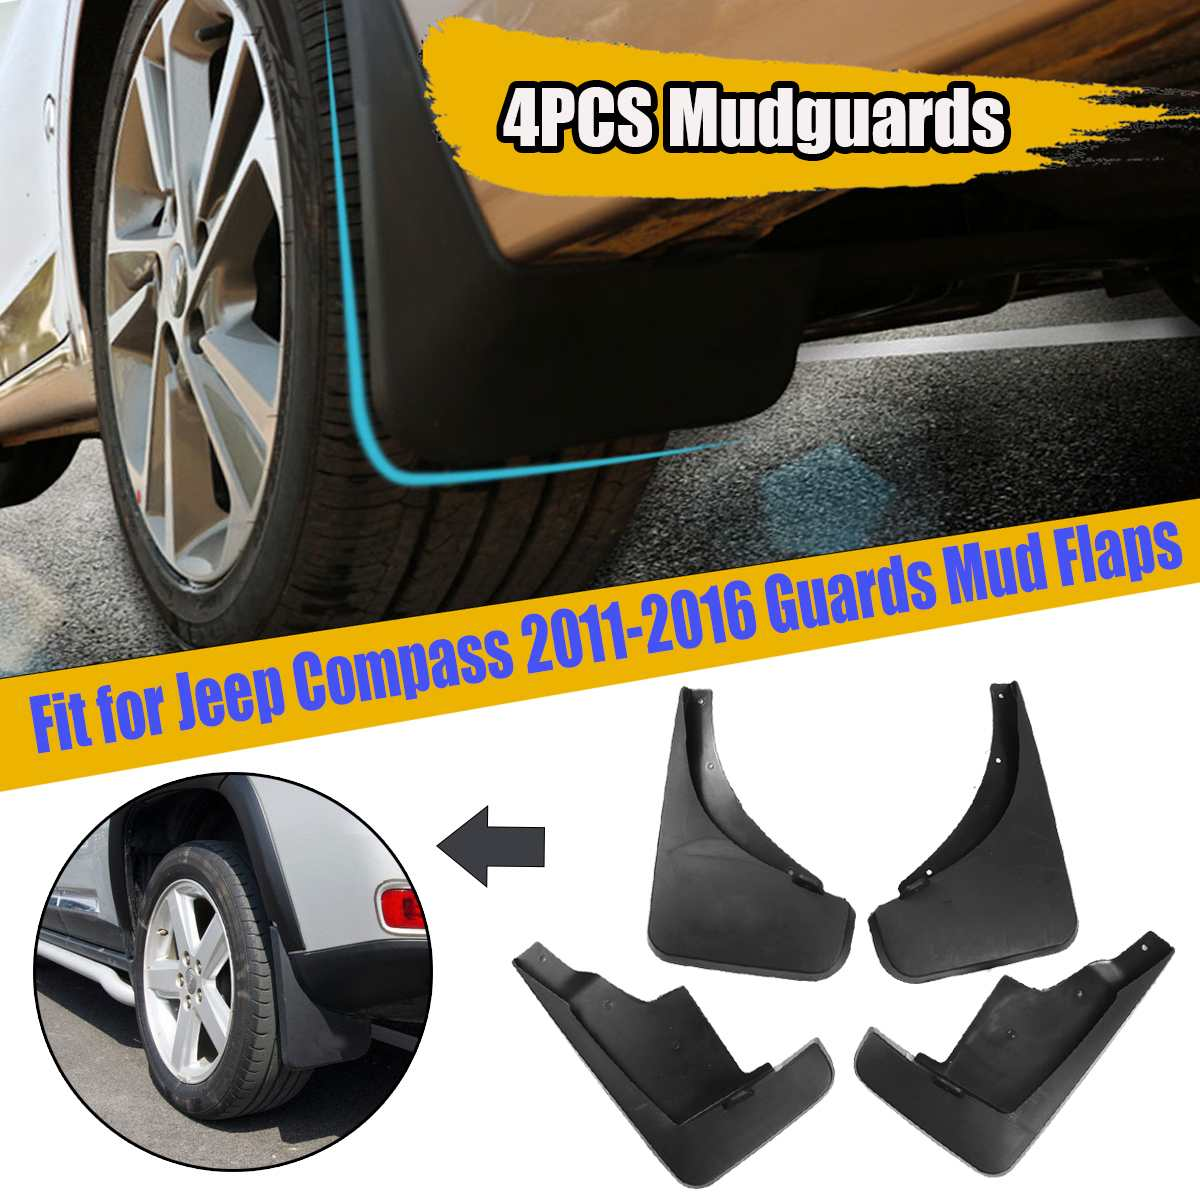 Mud Flaps Splash Guards Wheel Fender Mudguard for Jeep Patriot 2011 2012 2013 2014 2015 4PCS